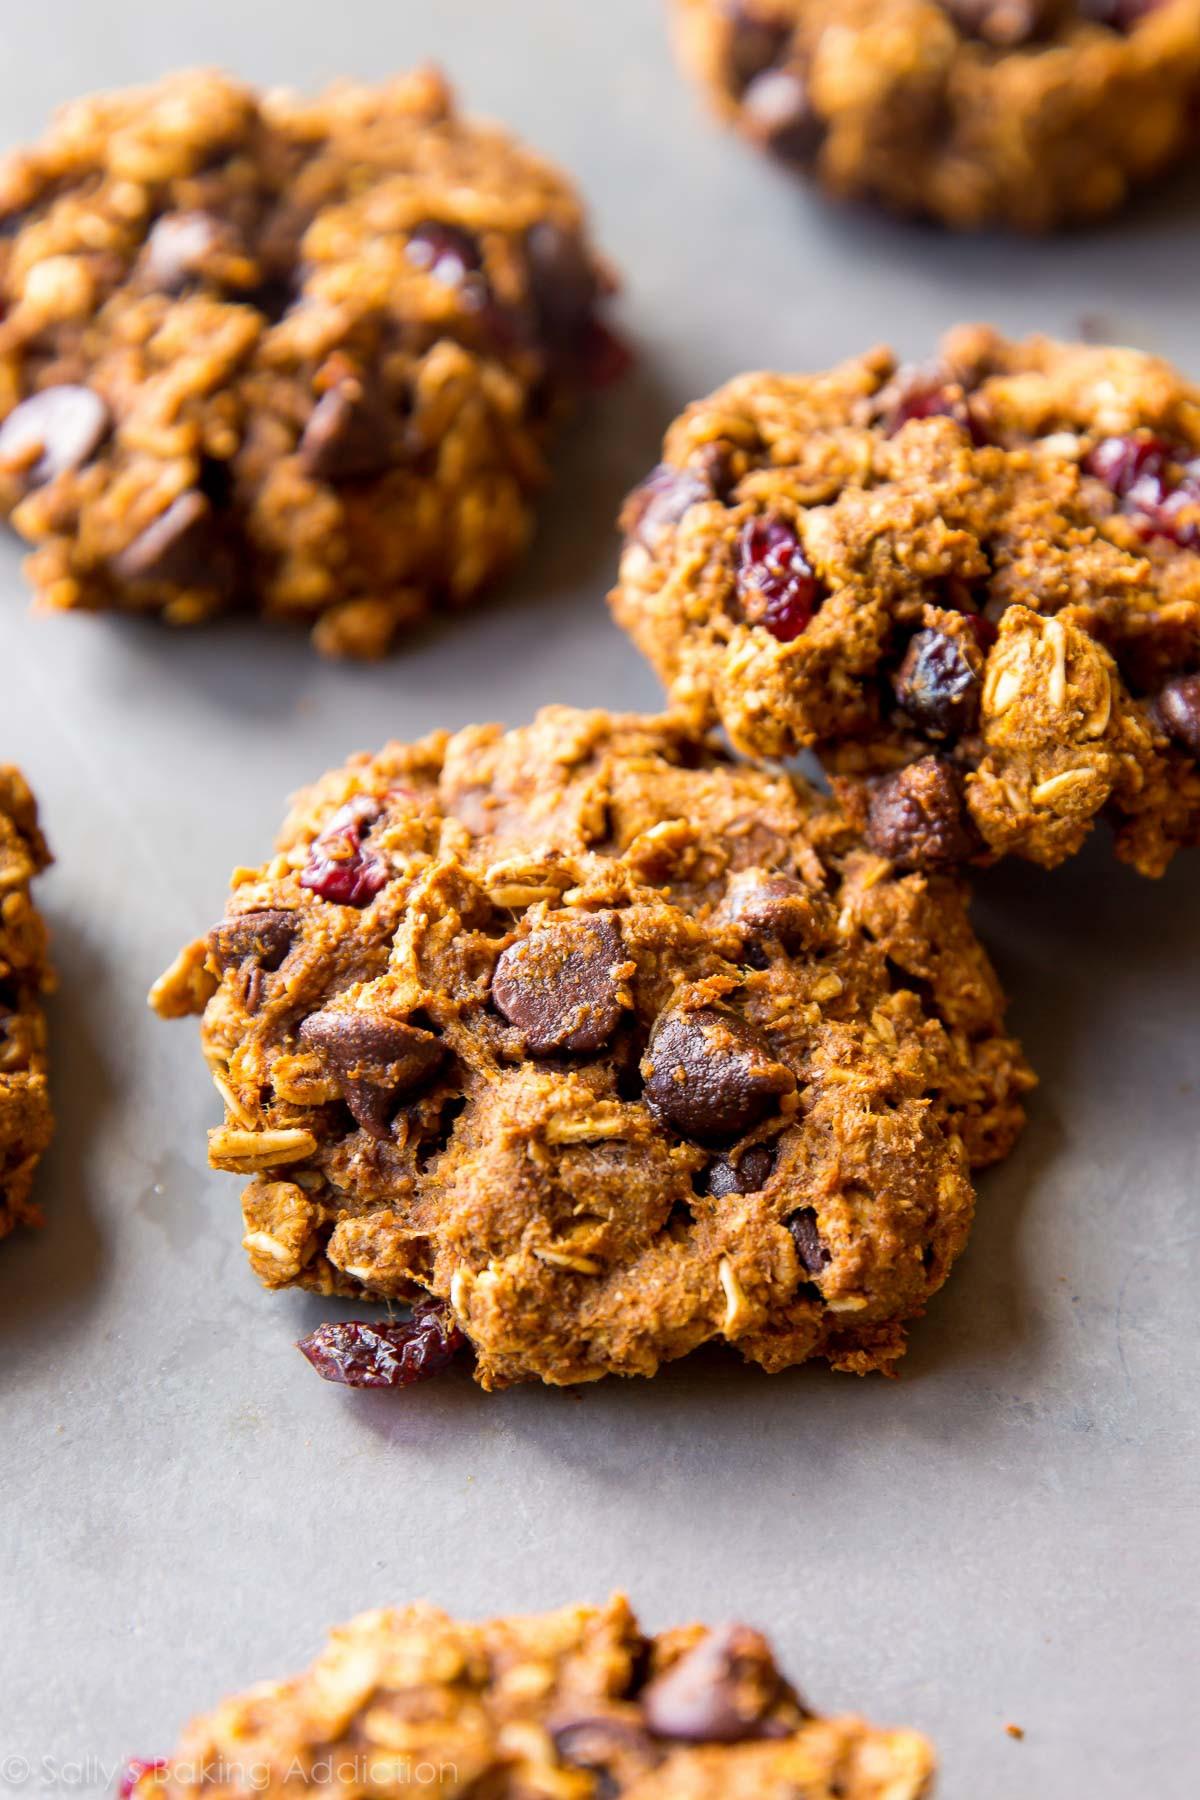 Chocolate Oatmeal Cookies Healthy  Healthy Pumpkin Chocolate Chip Oatmeal Cookies Sallys